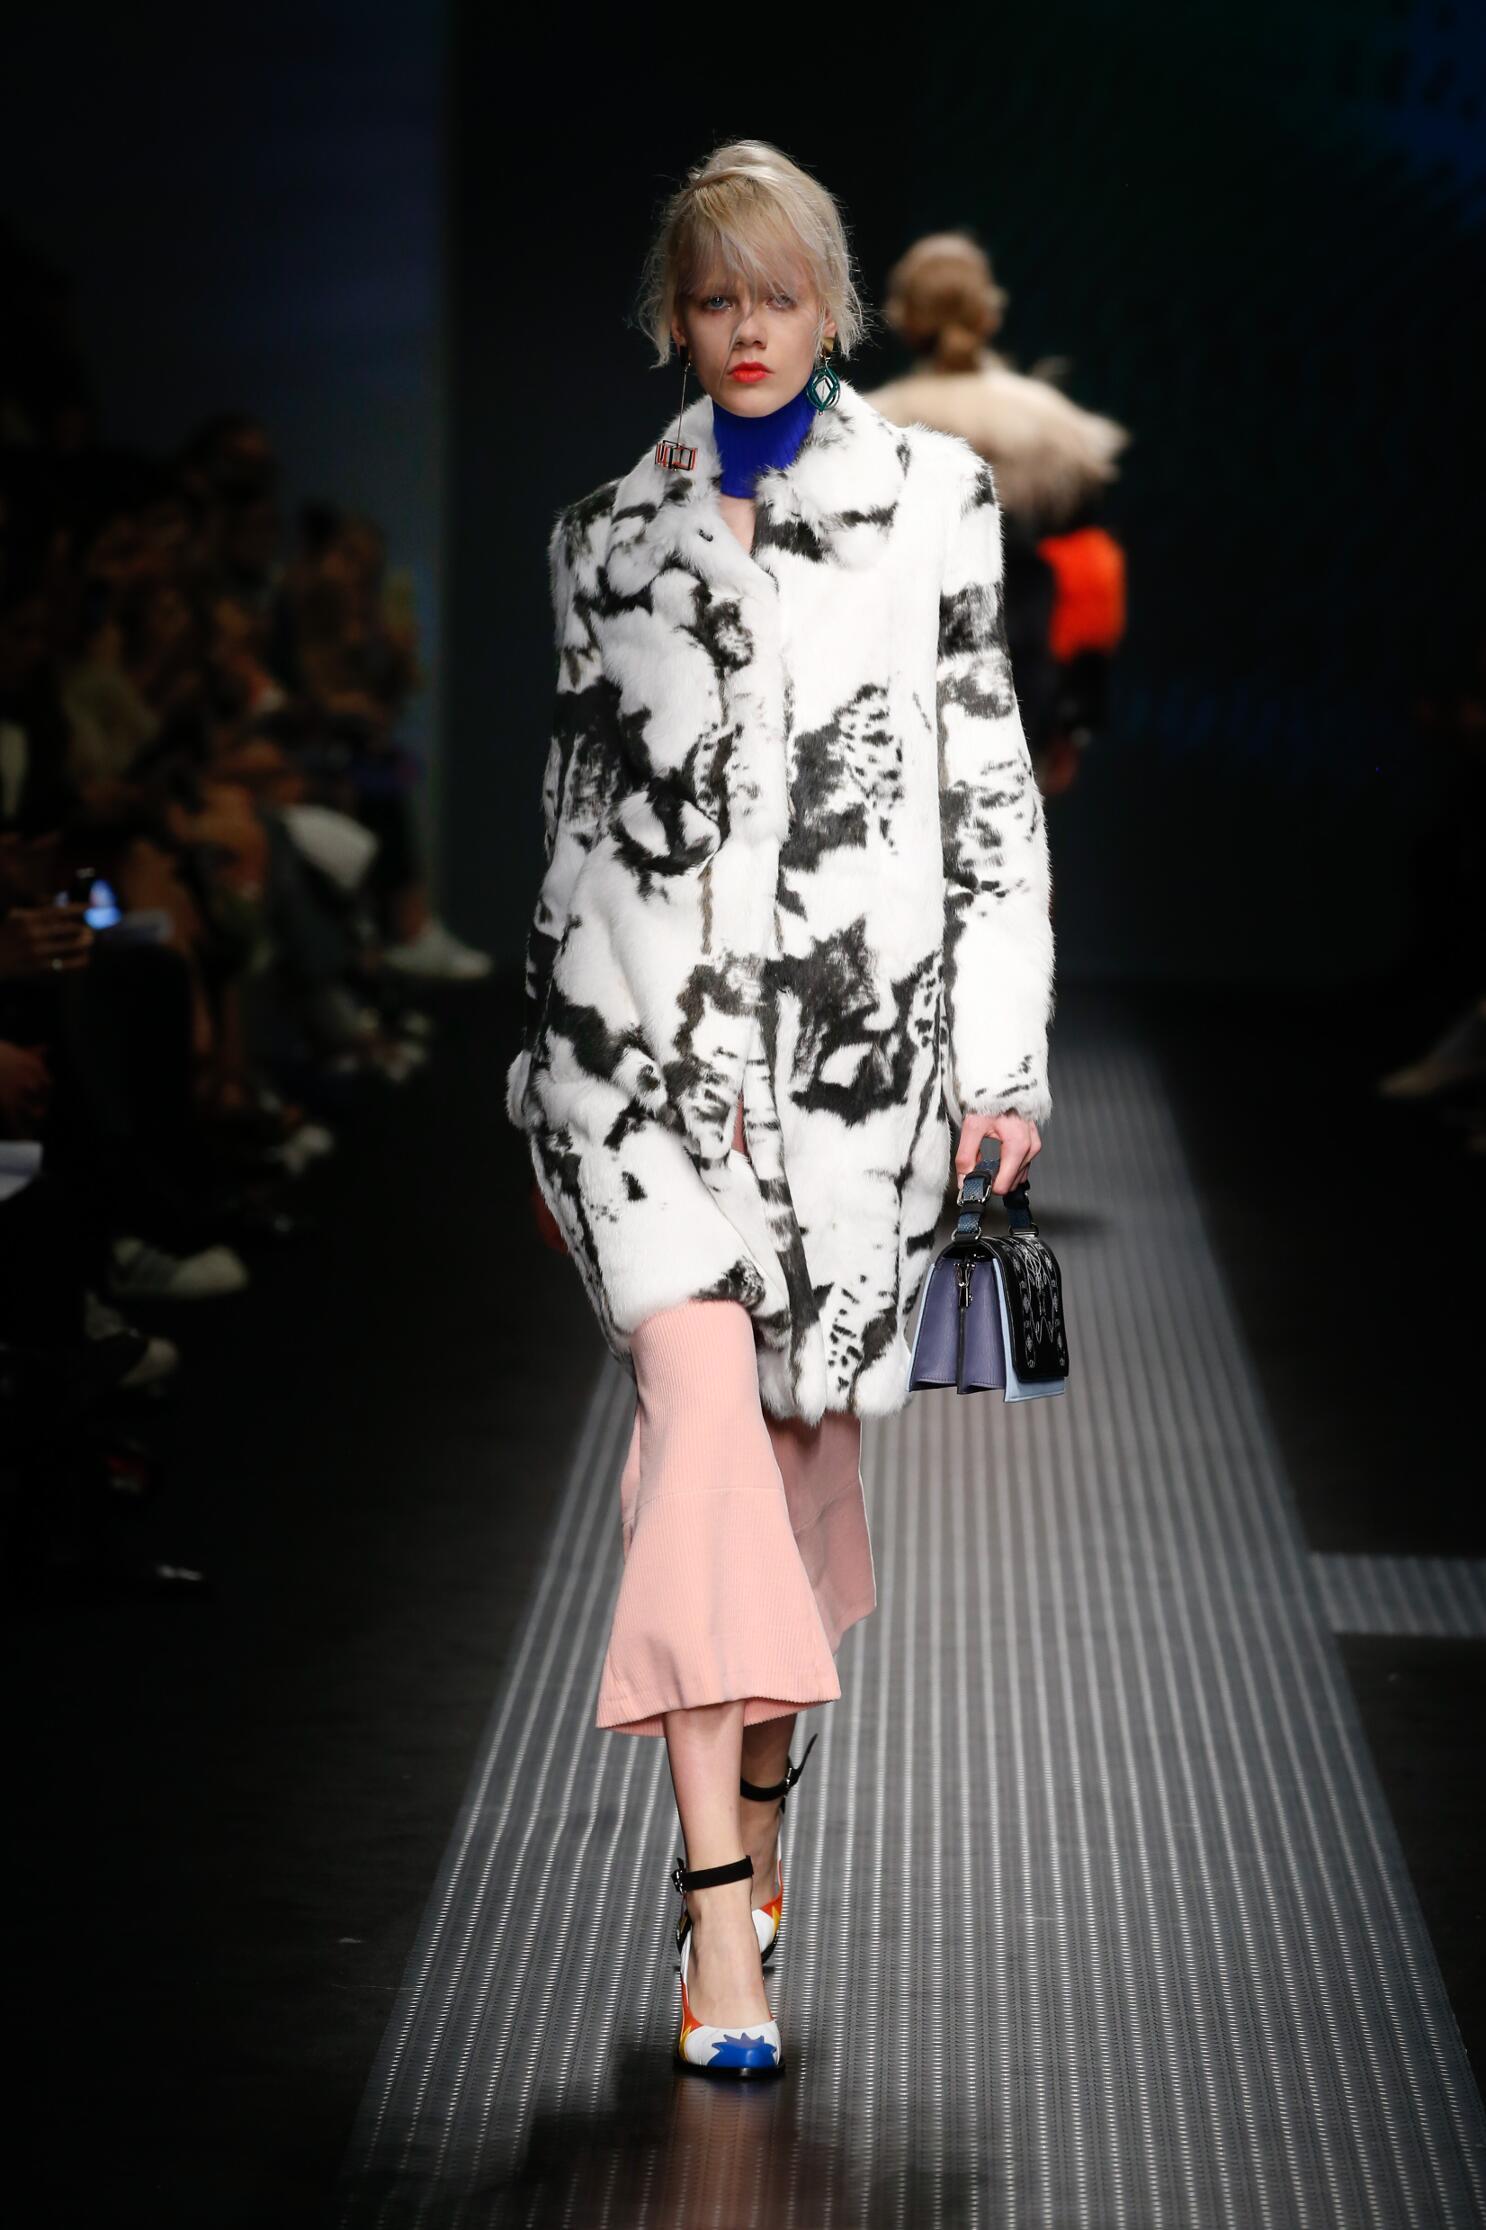 Catwalk Msgm Fall Winter 2015 16 Women's Collection Milan Fashion Week